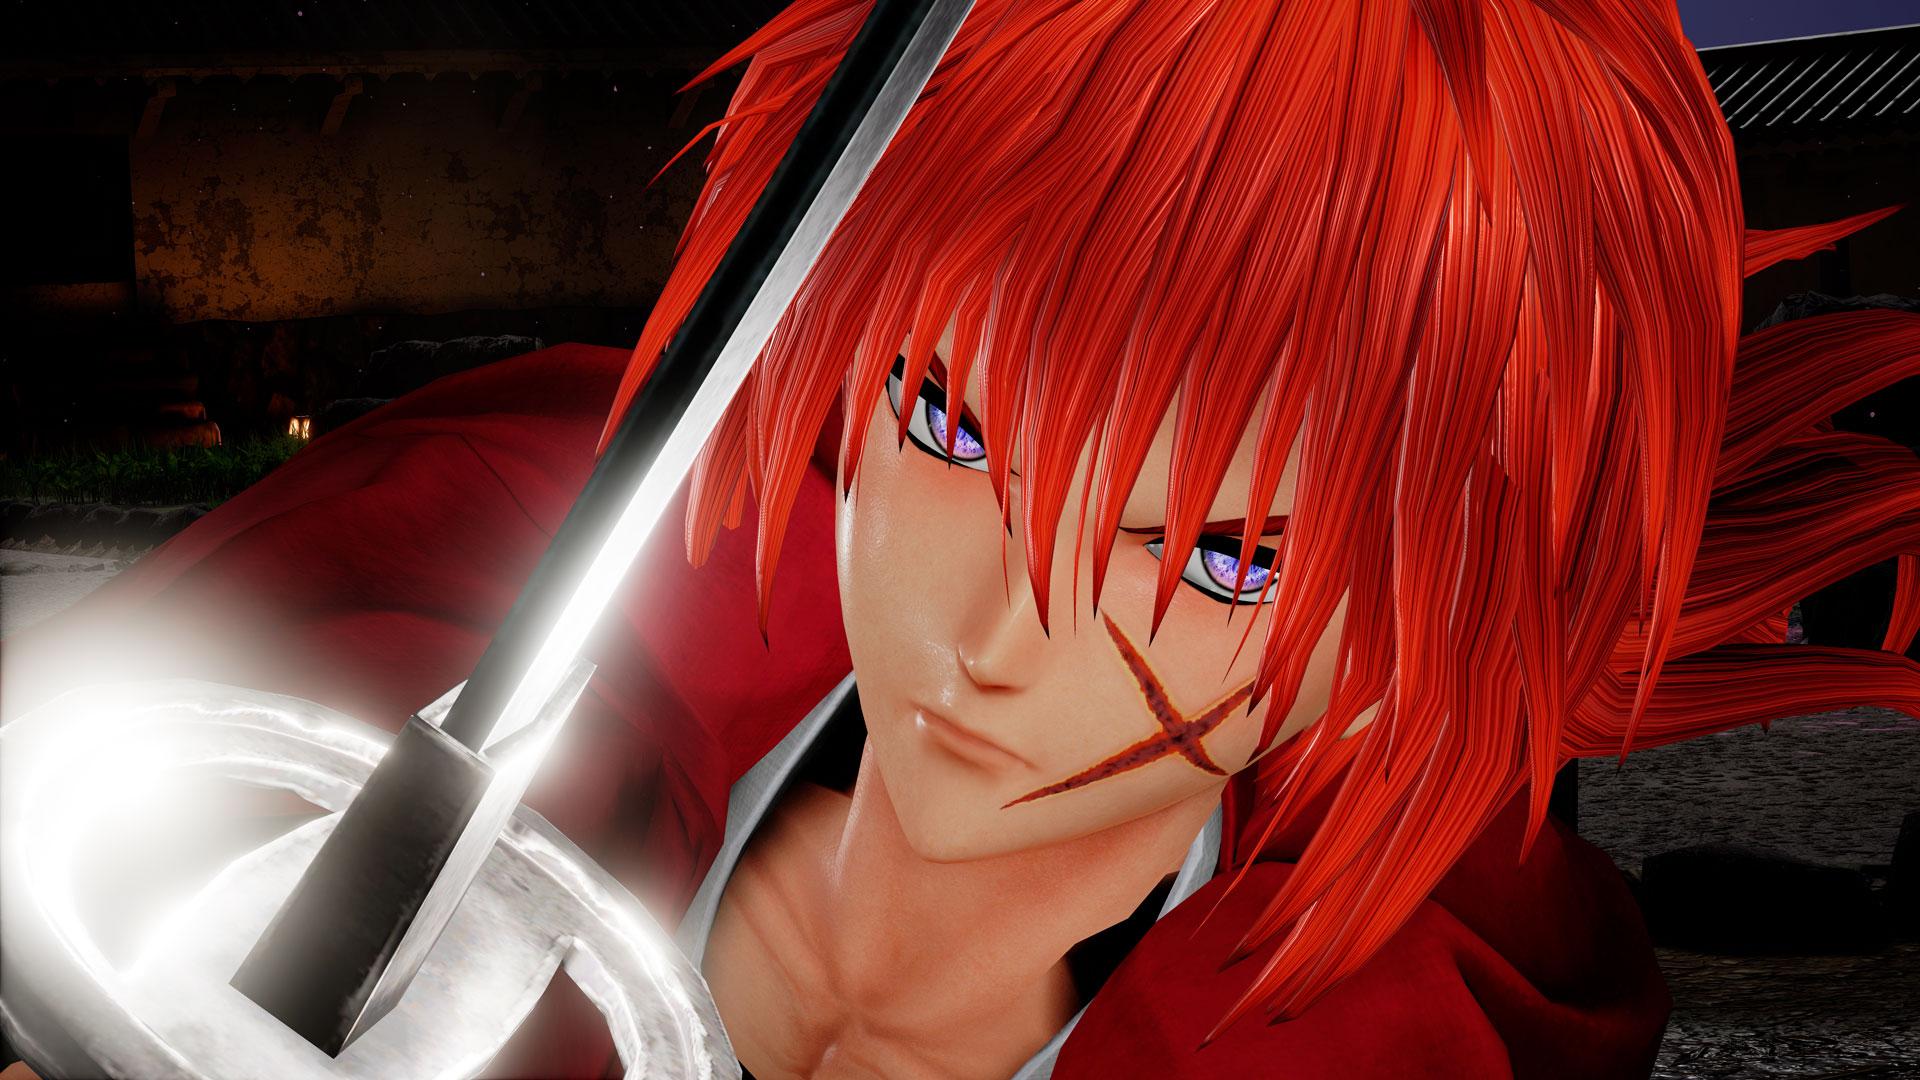 Kenshin Himura y MakotoShishio